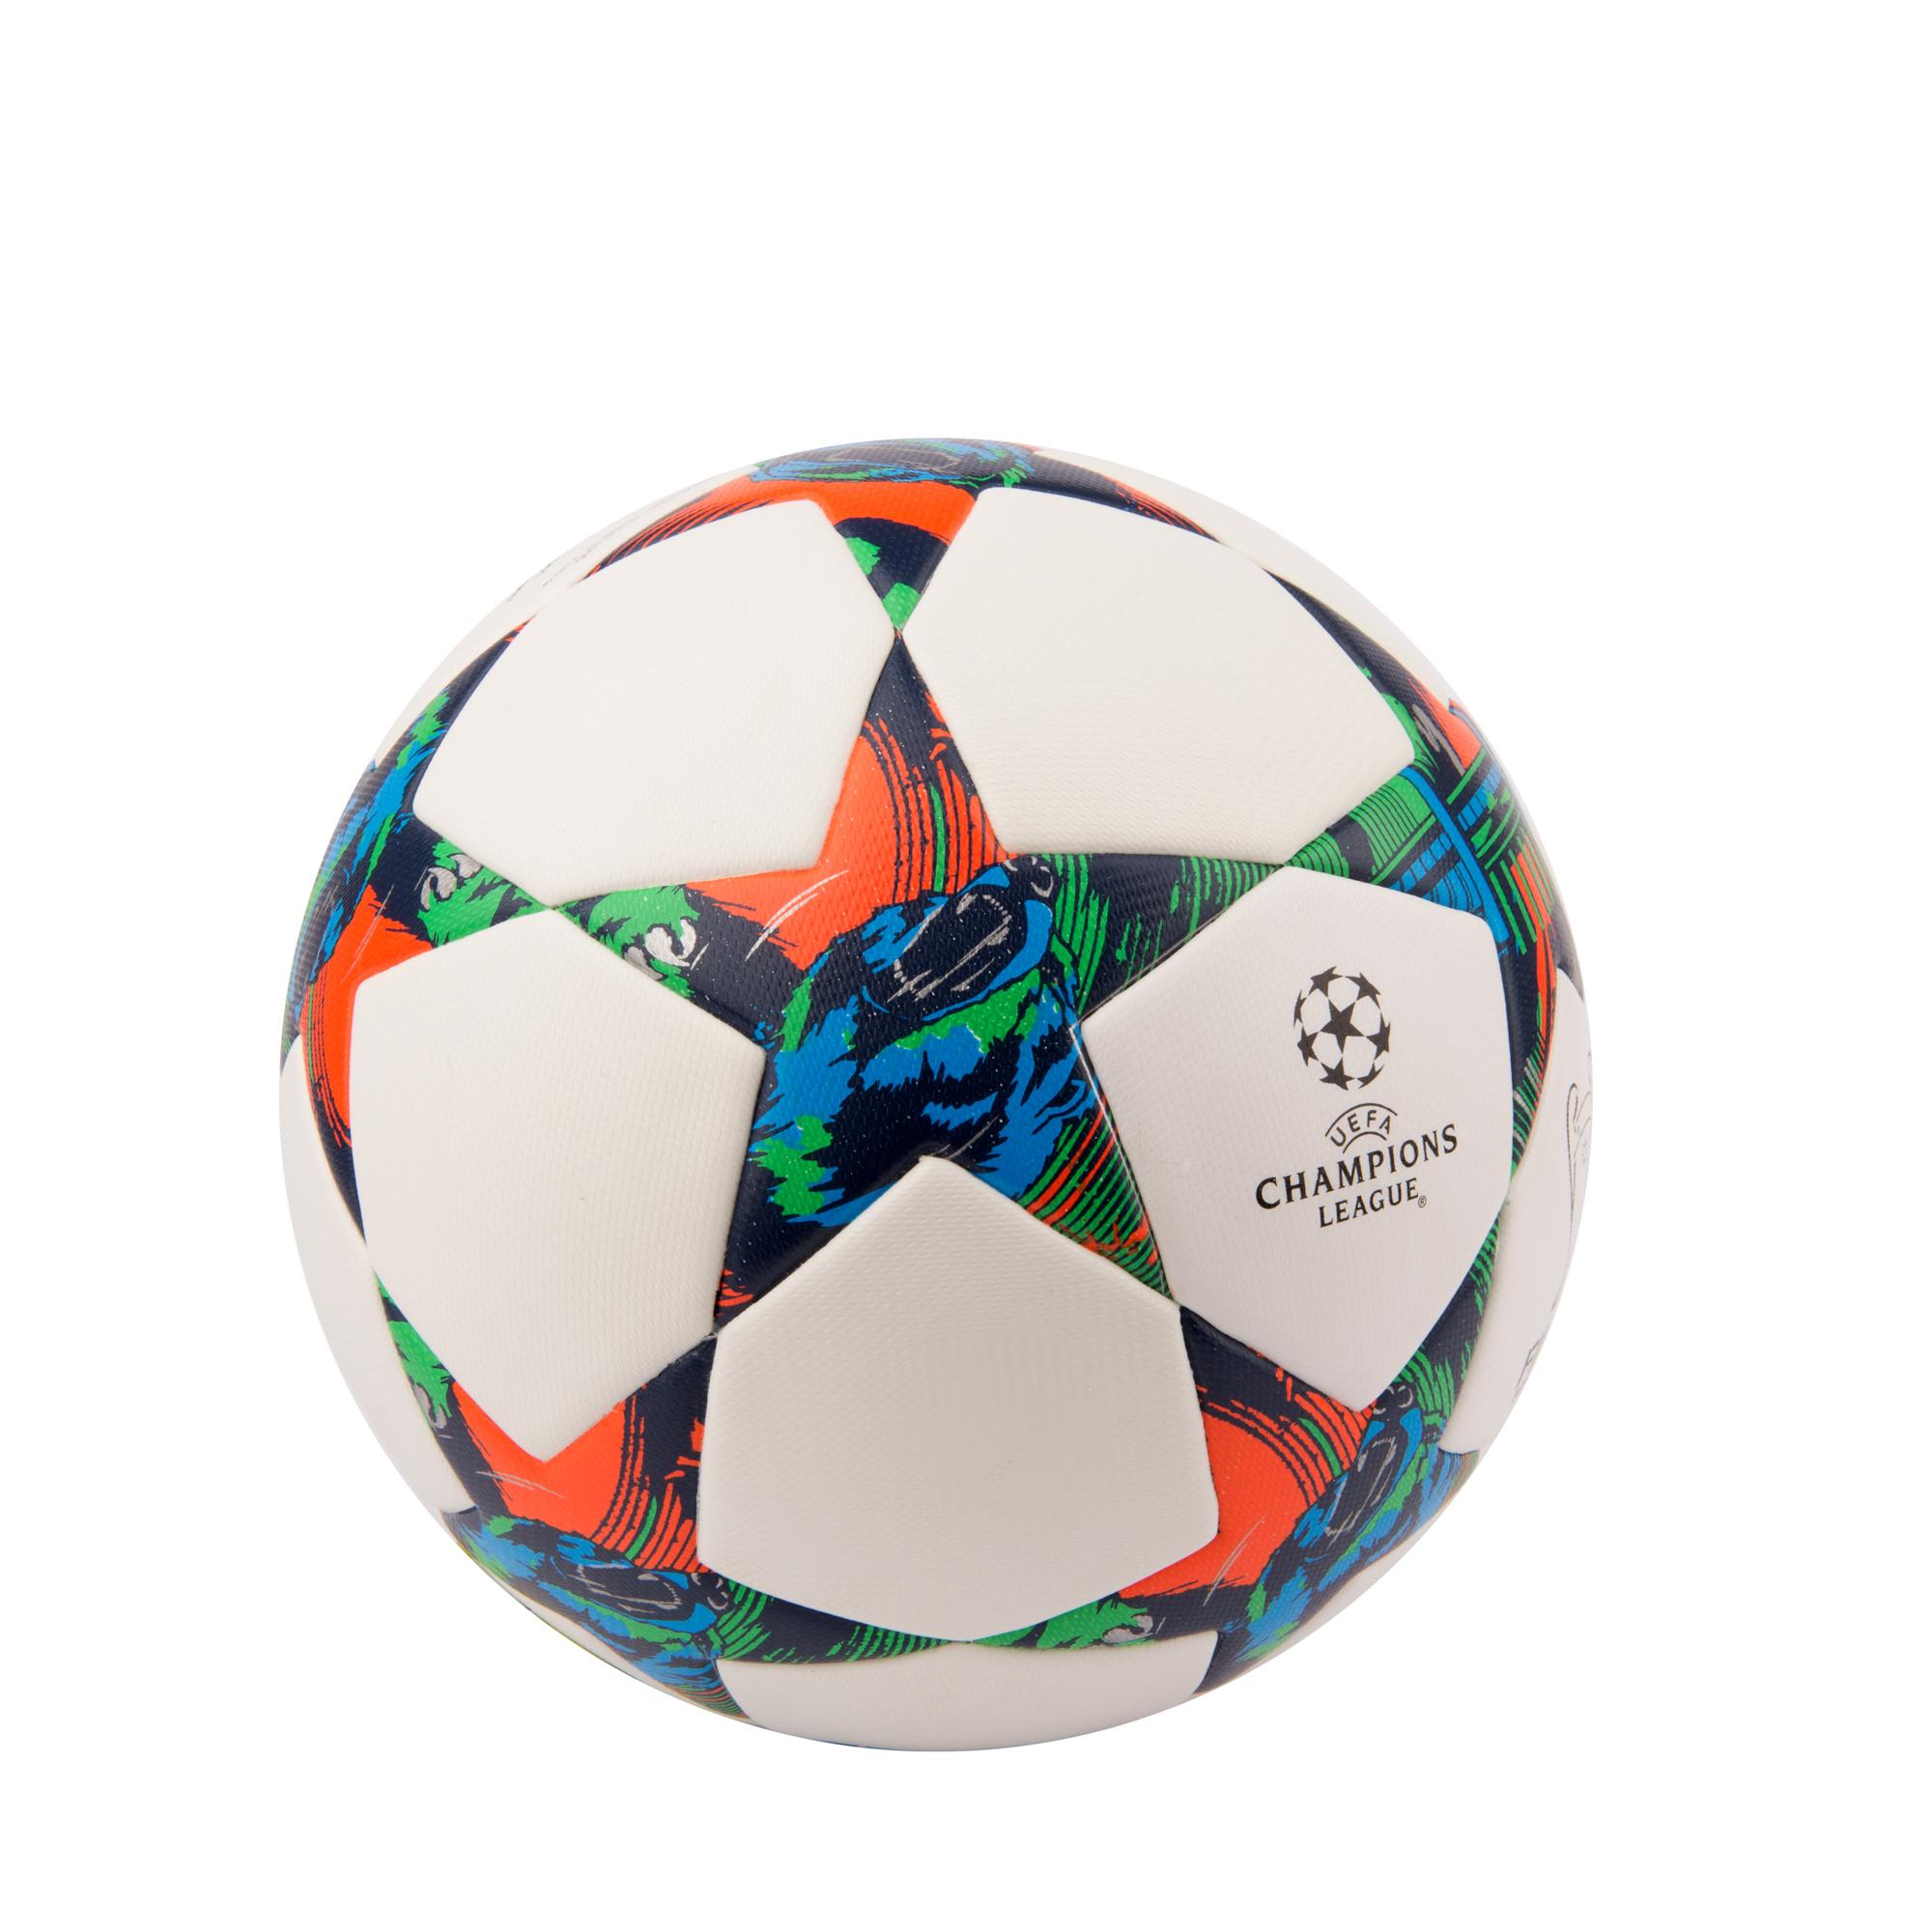 Football ball 2015-2016 season Champion league ball Final Berlin soccer ball High Quality football PU size 5 YC014(China (Mainland))